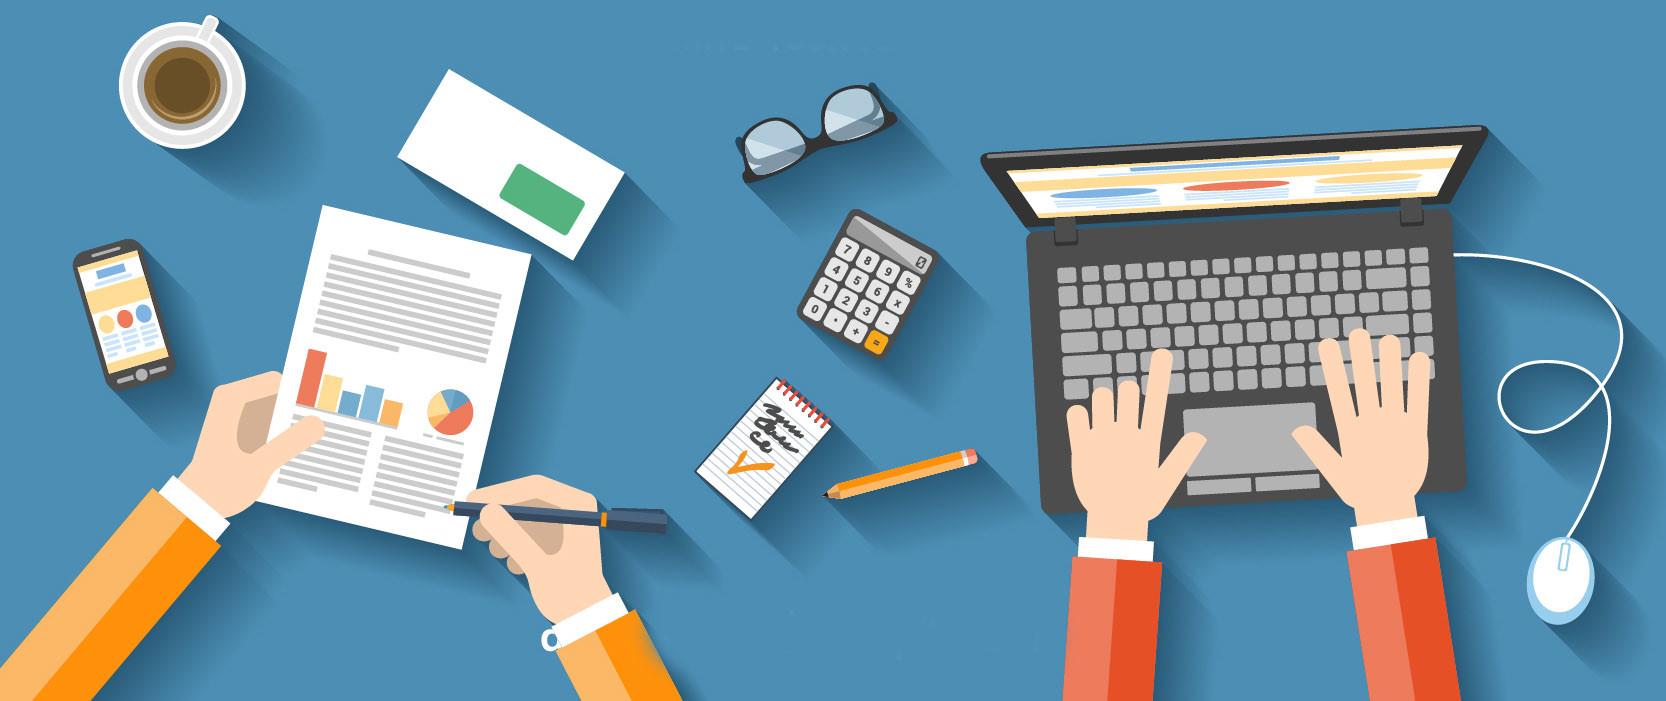 plugins wordpress social compartilhamento blog mídia social plugins